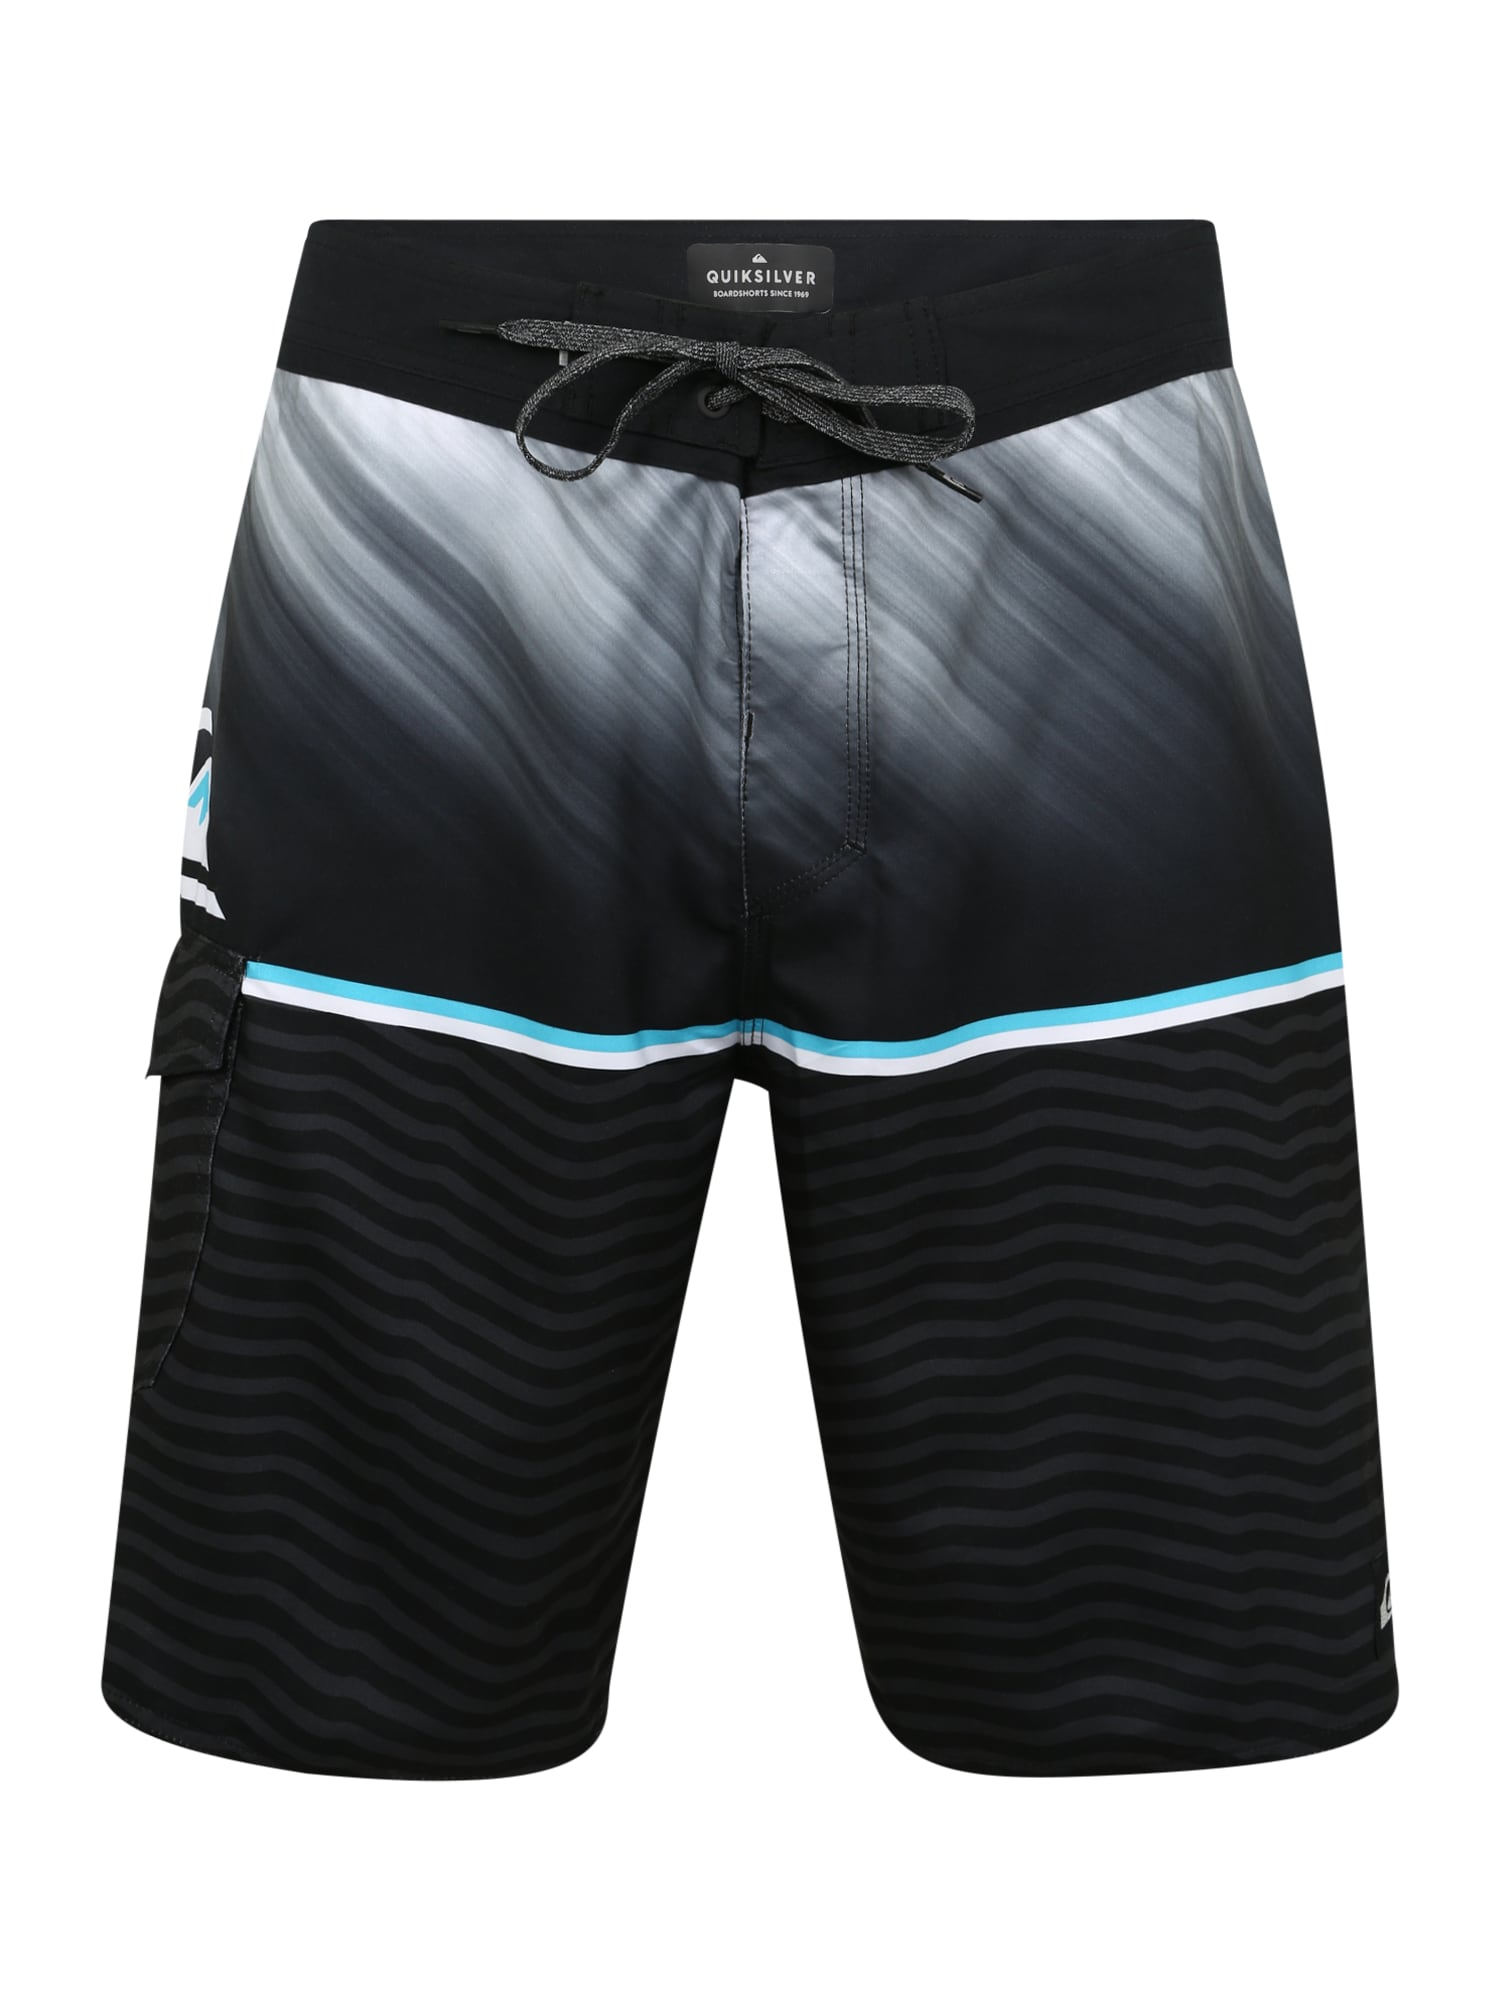 Plavky EVDAYDIV20 M BDSH modrá šedá černá QUIKSILVER